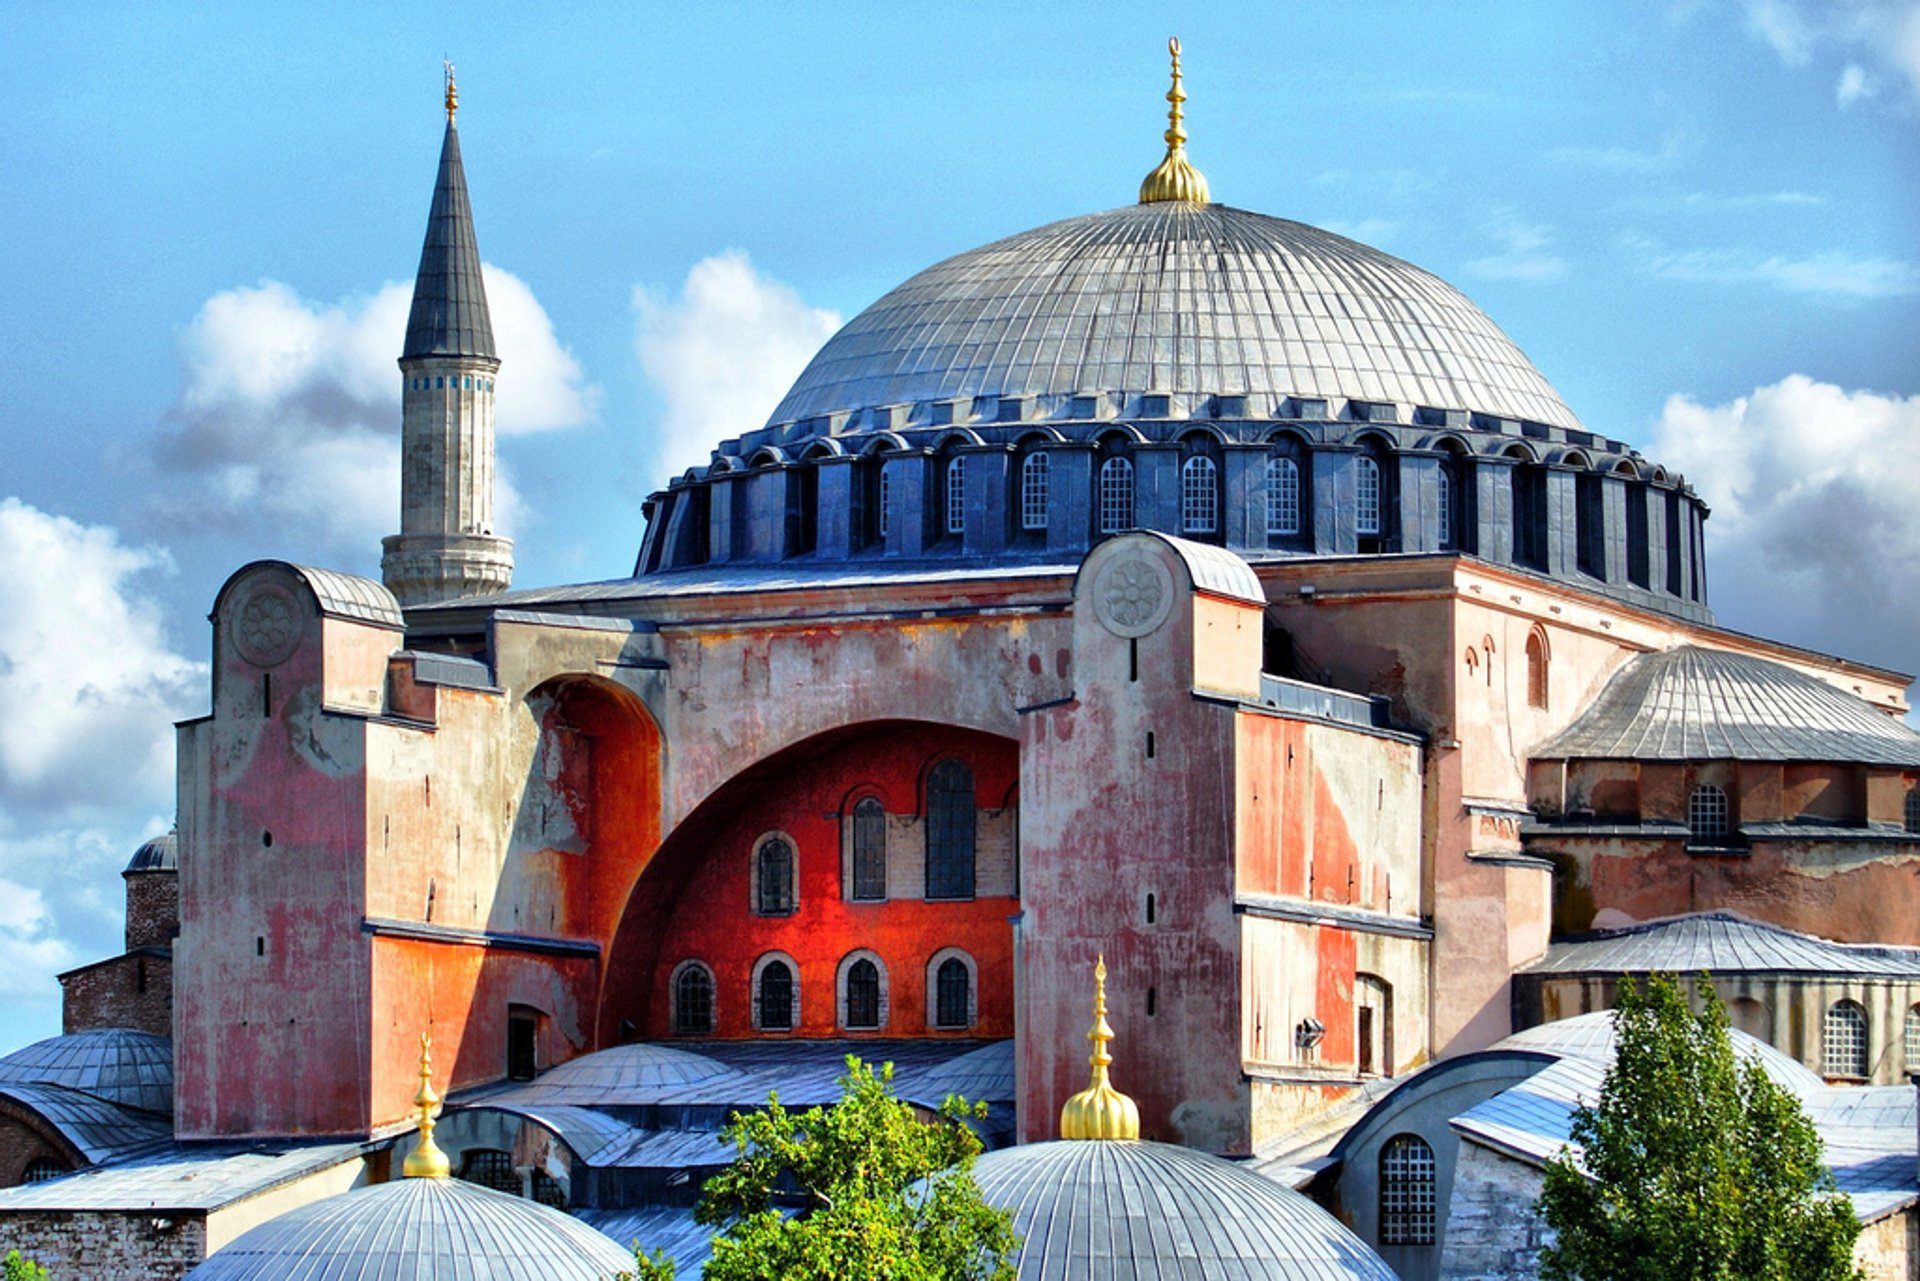 Hagia Sophia (Ayasofya) in Istanbul 2020 - Best Time